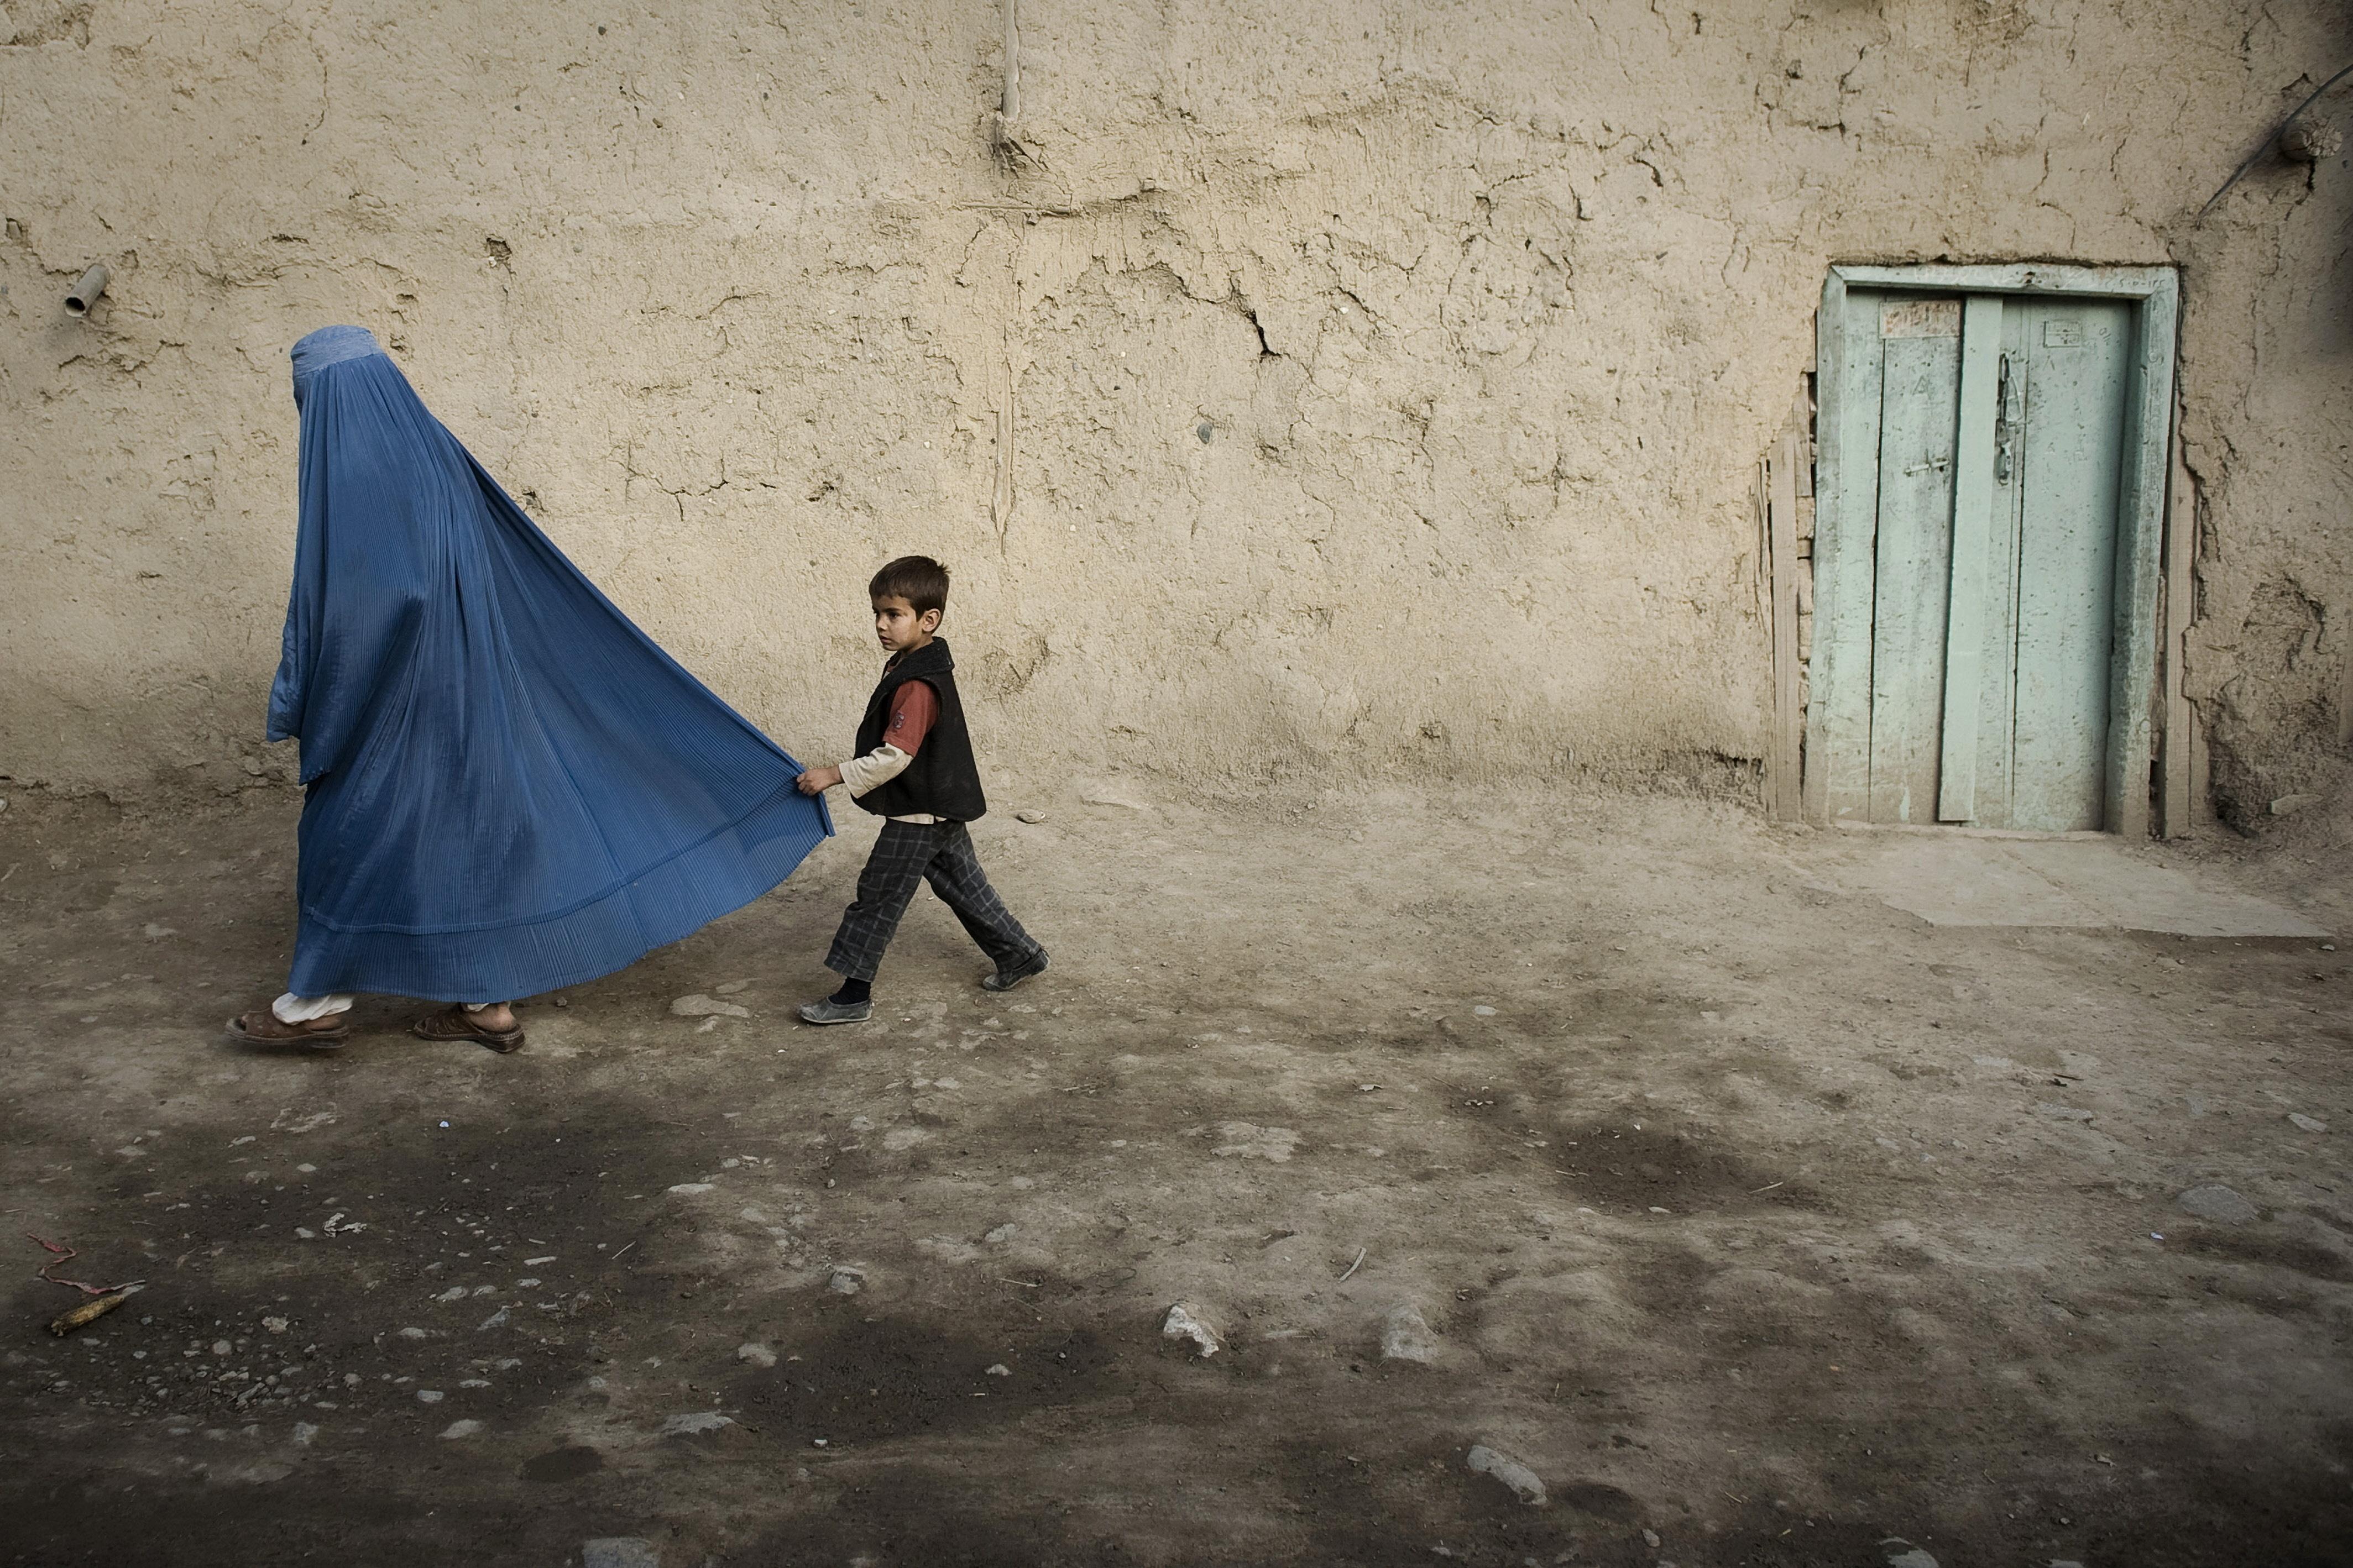 Afghan Parliament Halts Debate On Women's Rights Bill